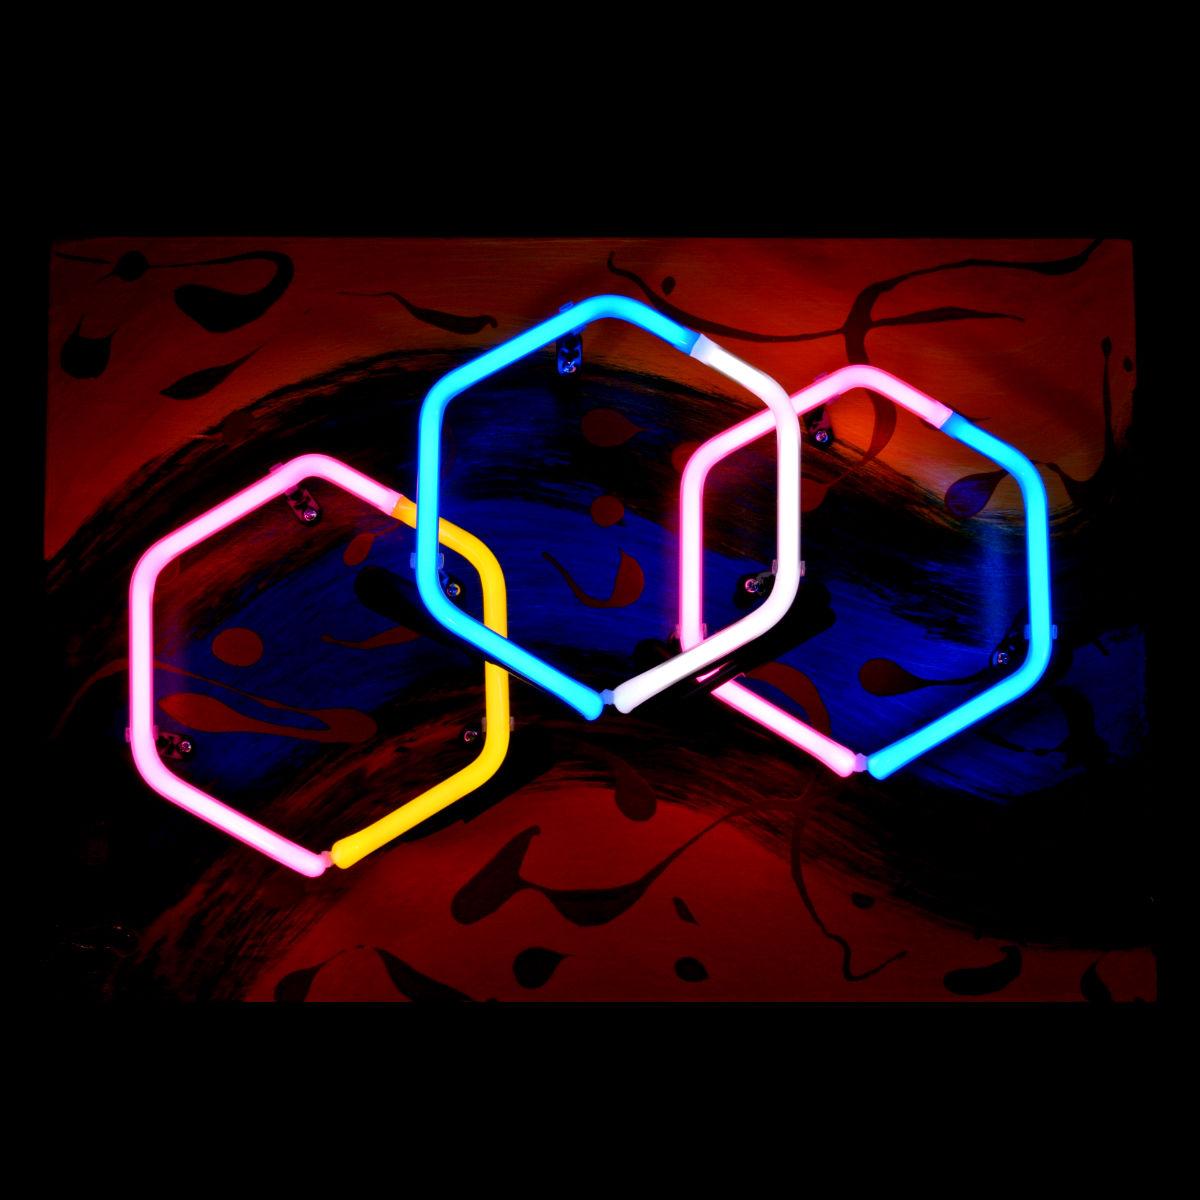 Parisian Neon Light Sculpture by John Barton - BartonNeonMagic.com